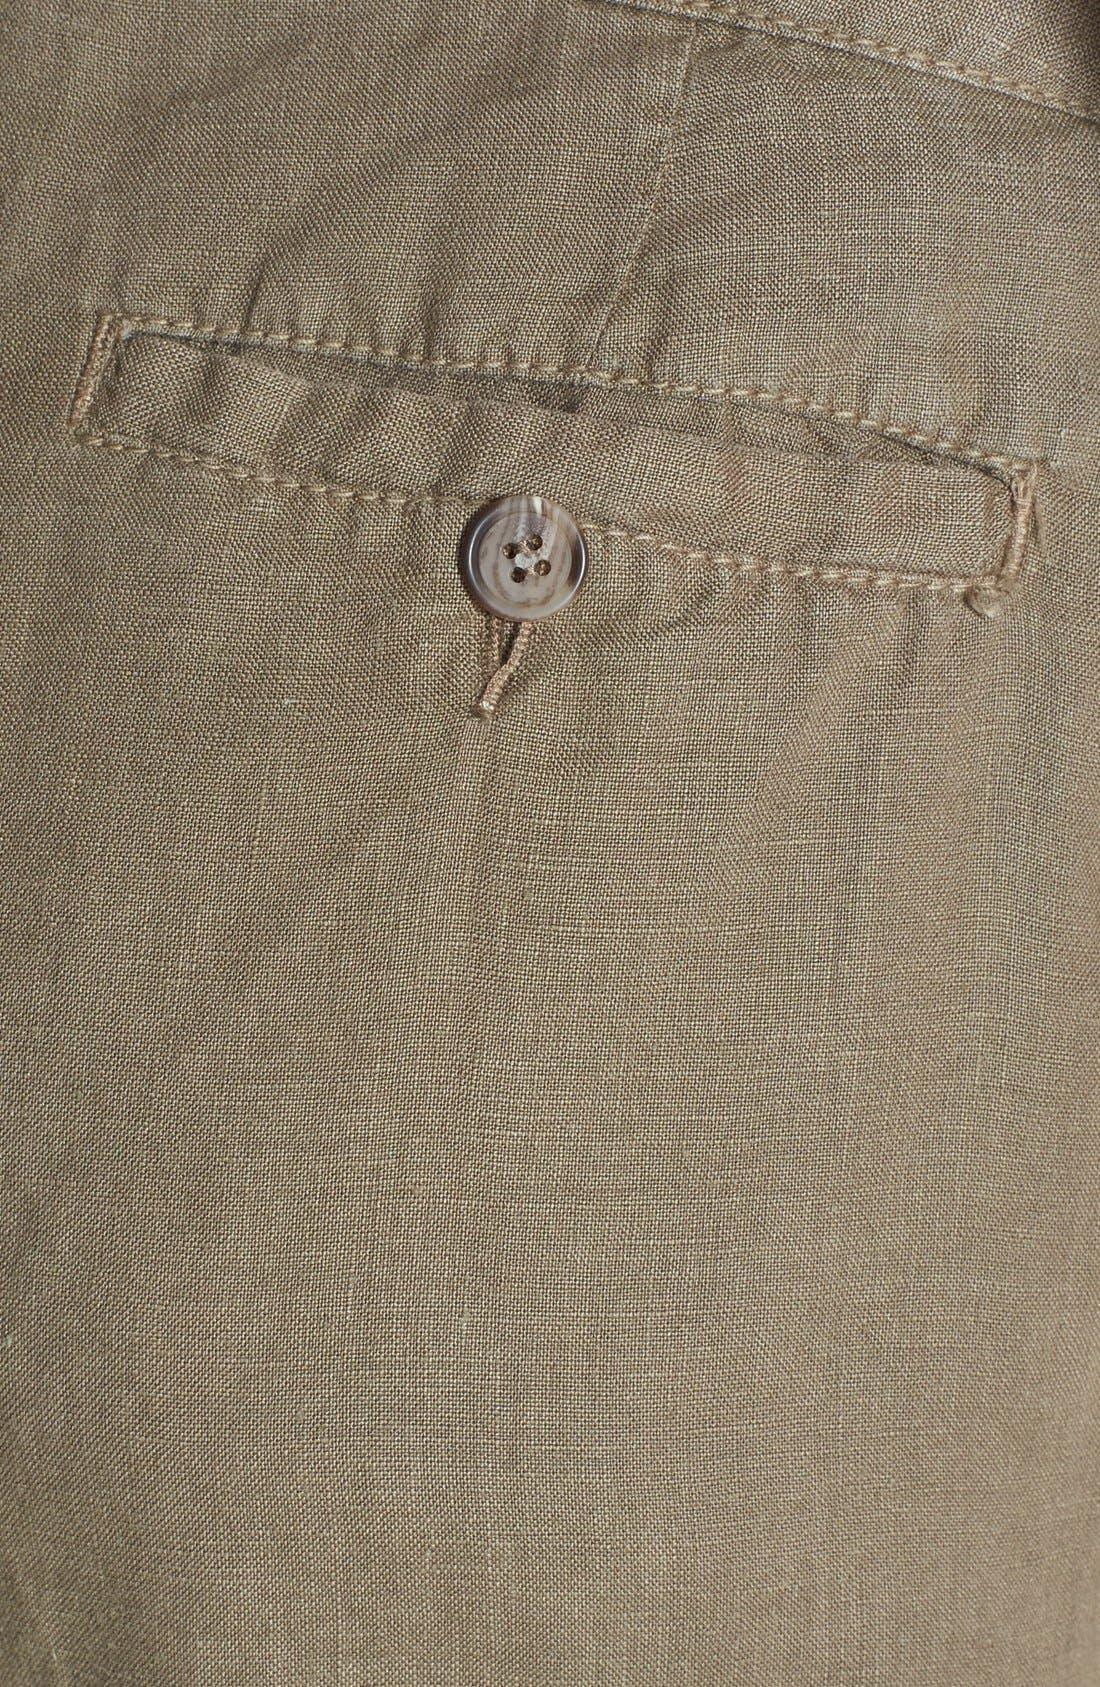 Alternate Image 3  - Joie 'Farrow' Linen Shorts